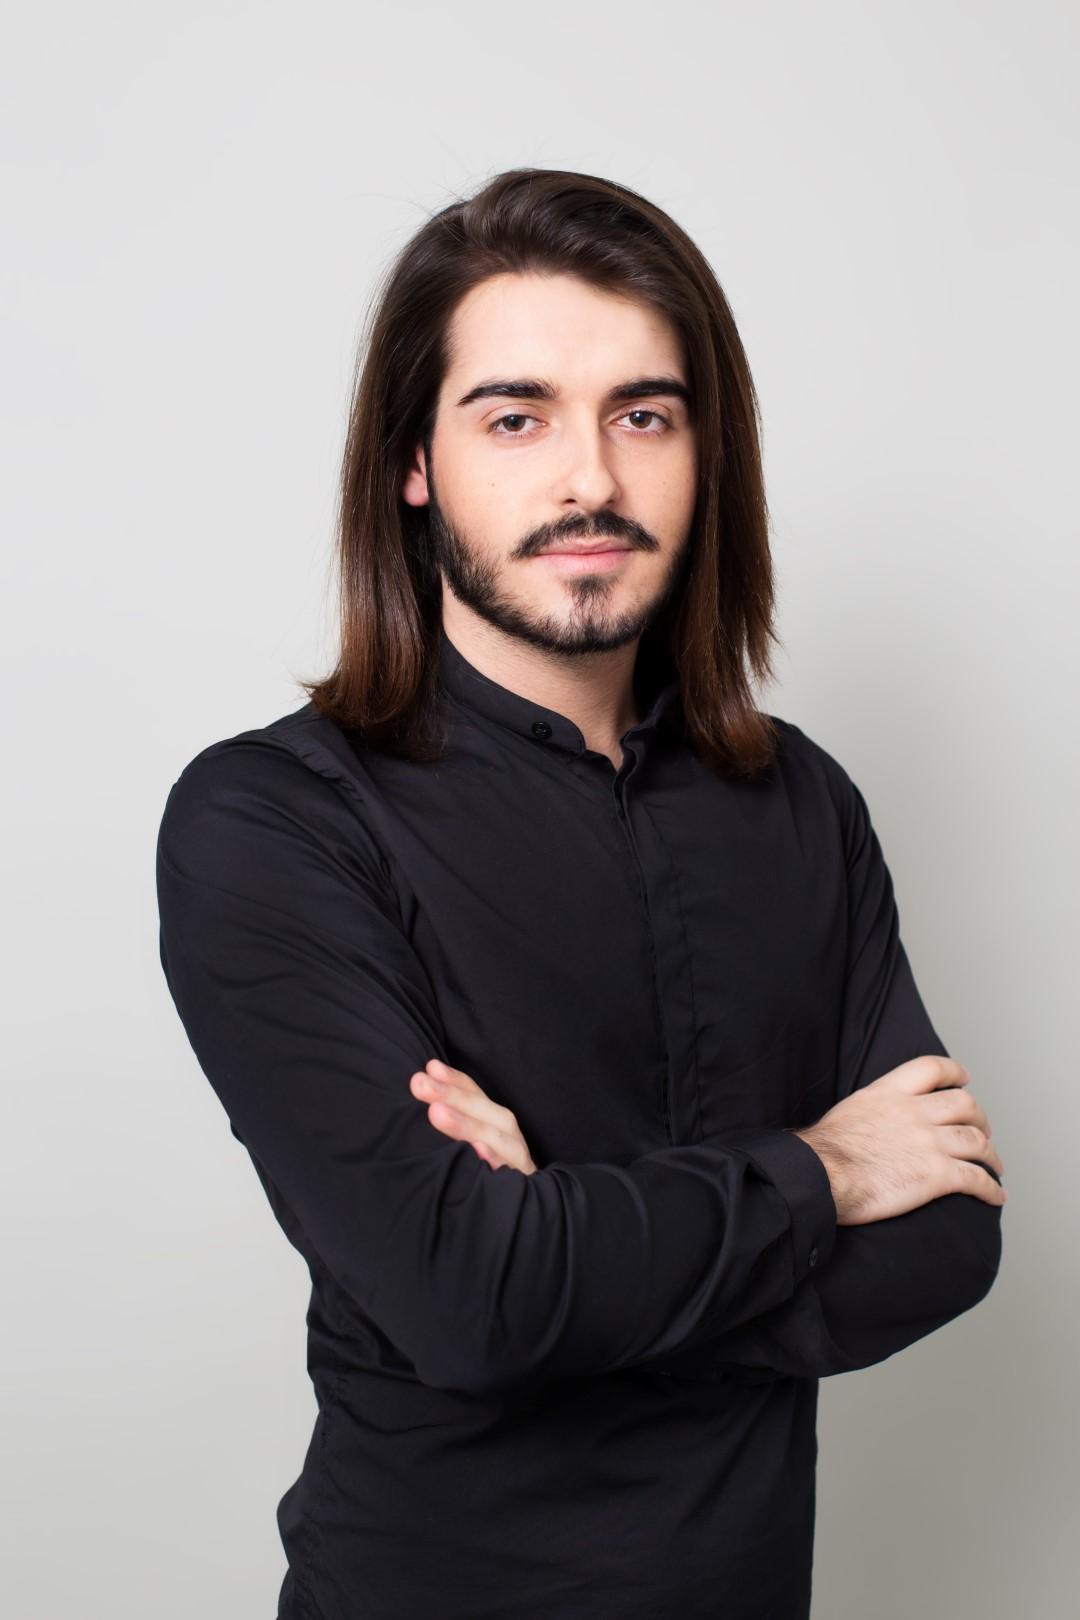 George Negrisan